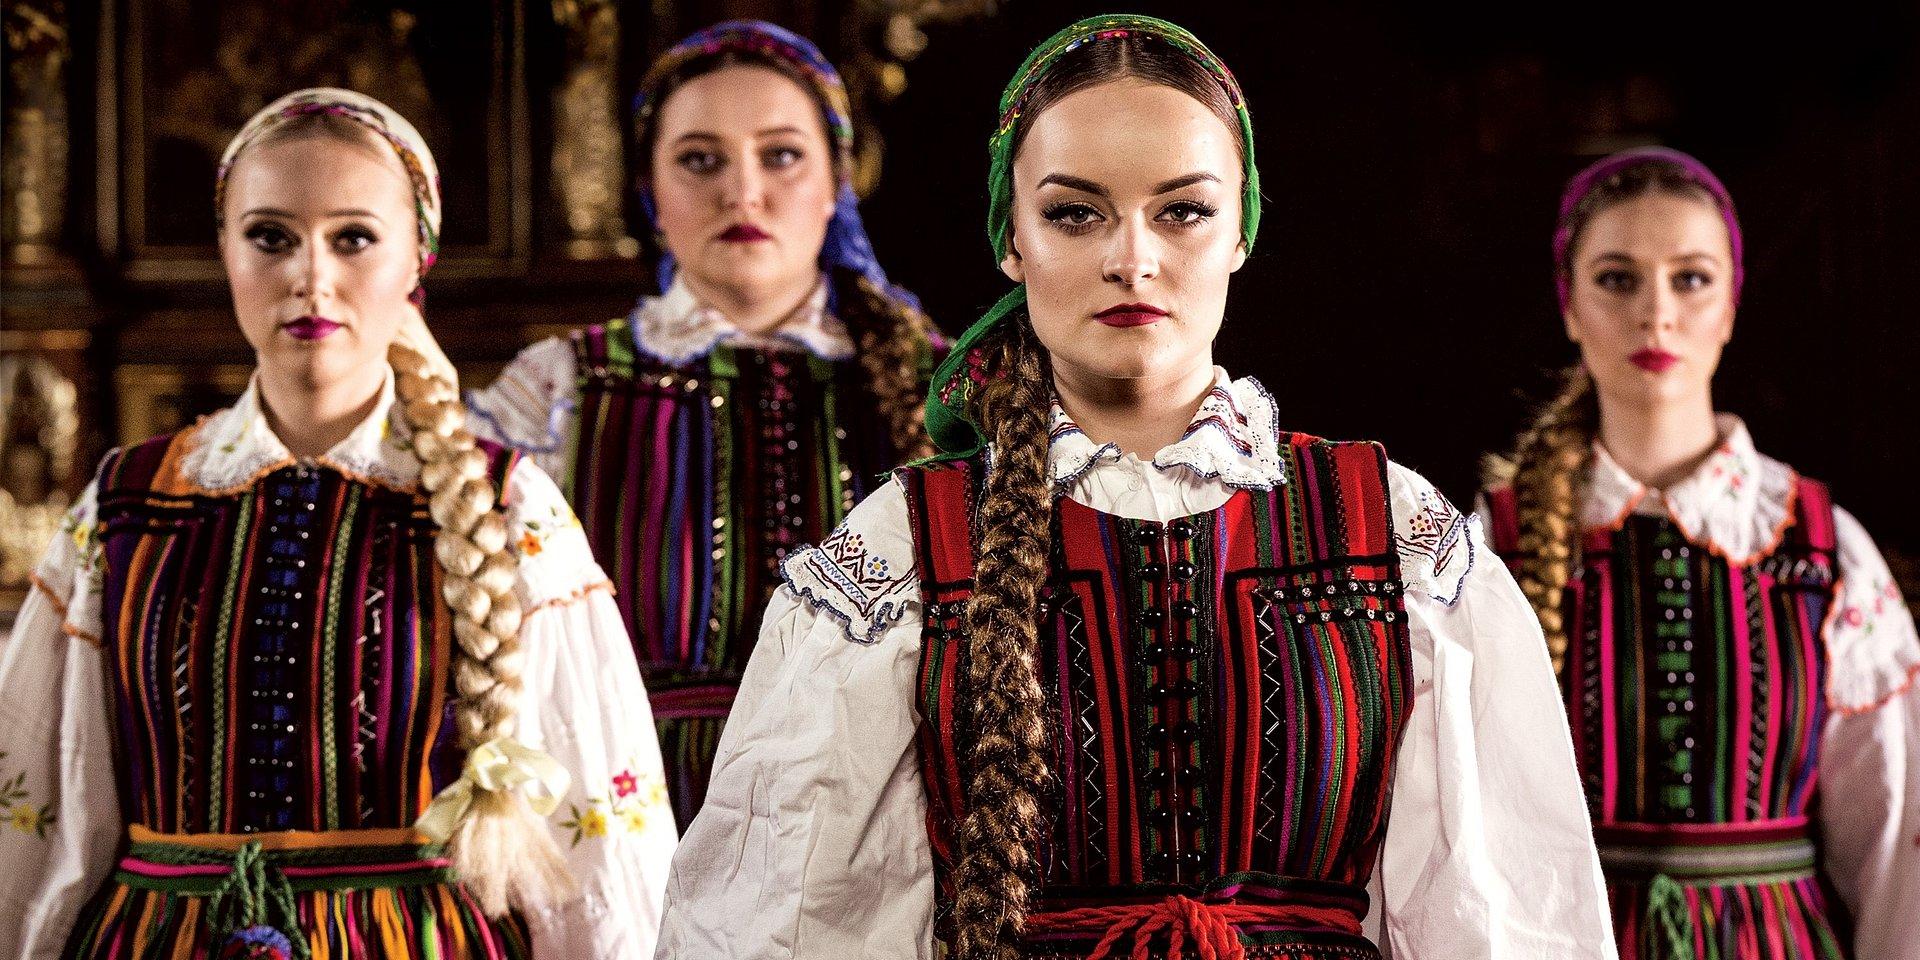 Tulia zaprasza na kolejne koncerty